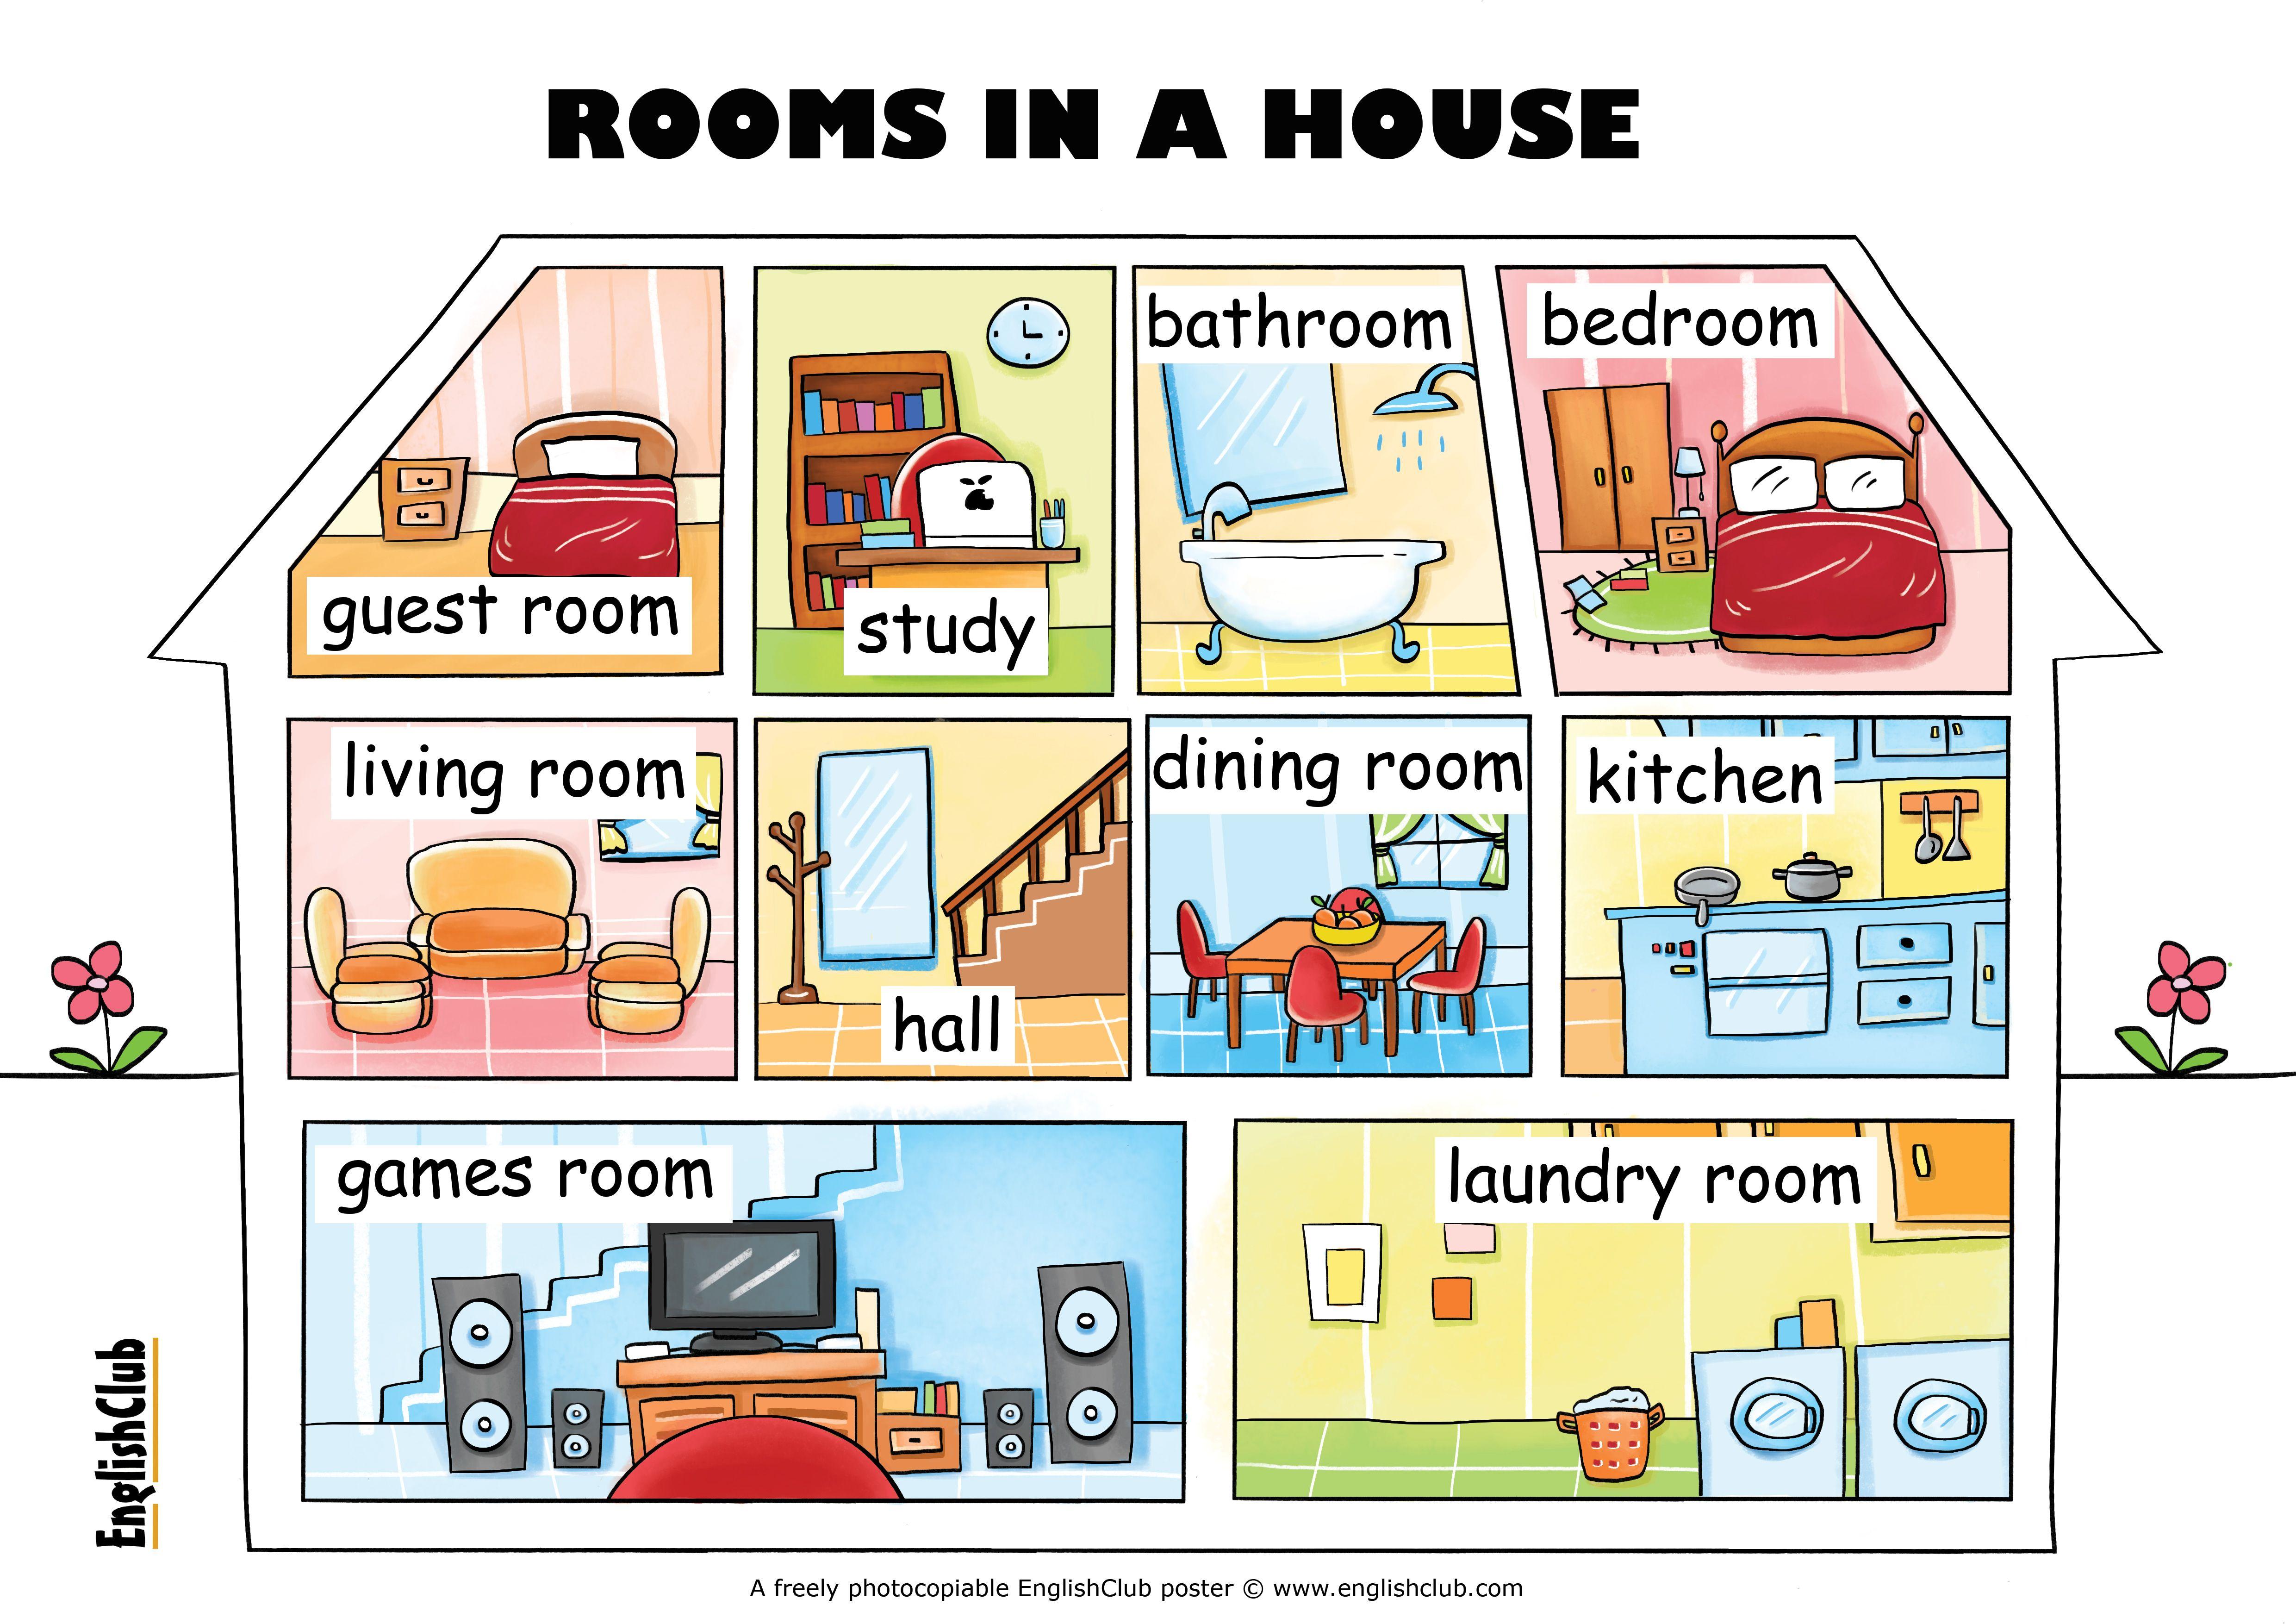 Картинка для описания дома на английском одно